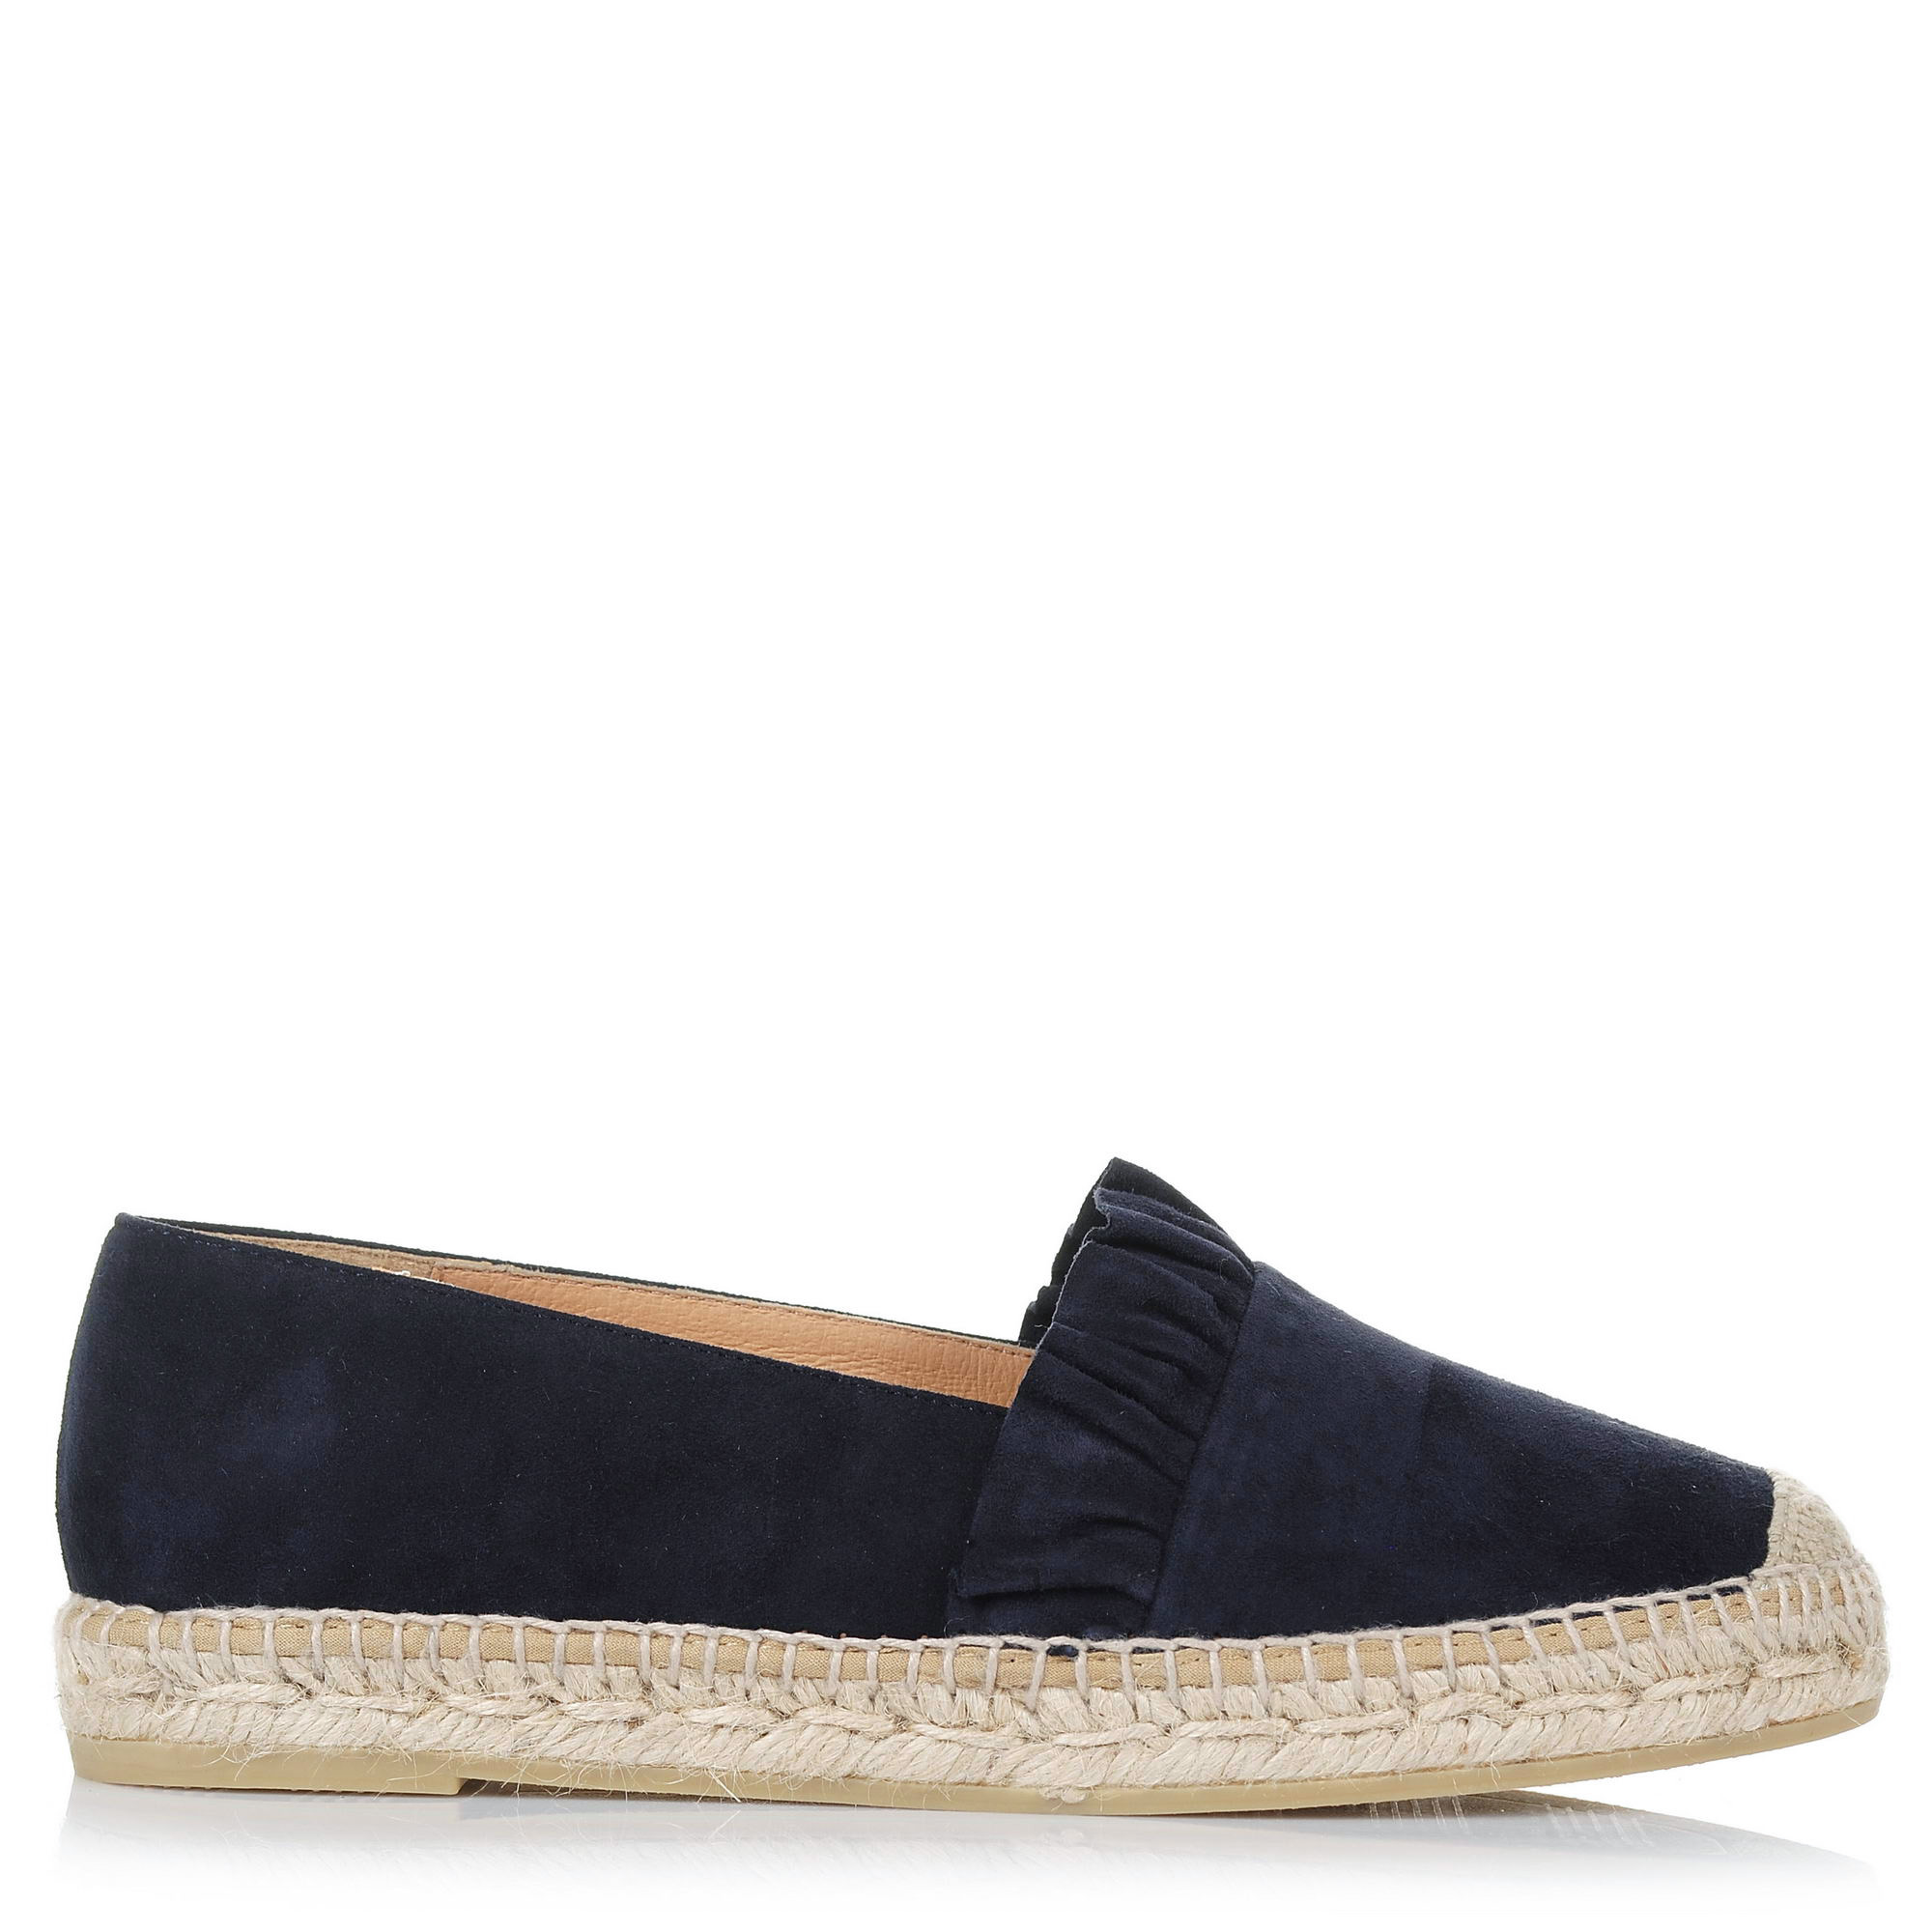 Suede Δερμάτινες Εσπαντρίγιες Kanna KV8000 γυναικα   γυναικείο παπούτσι